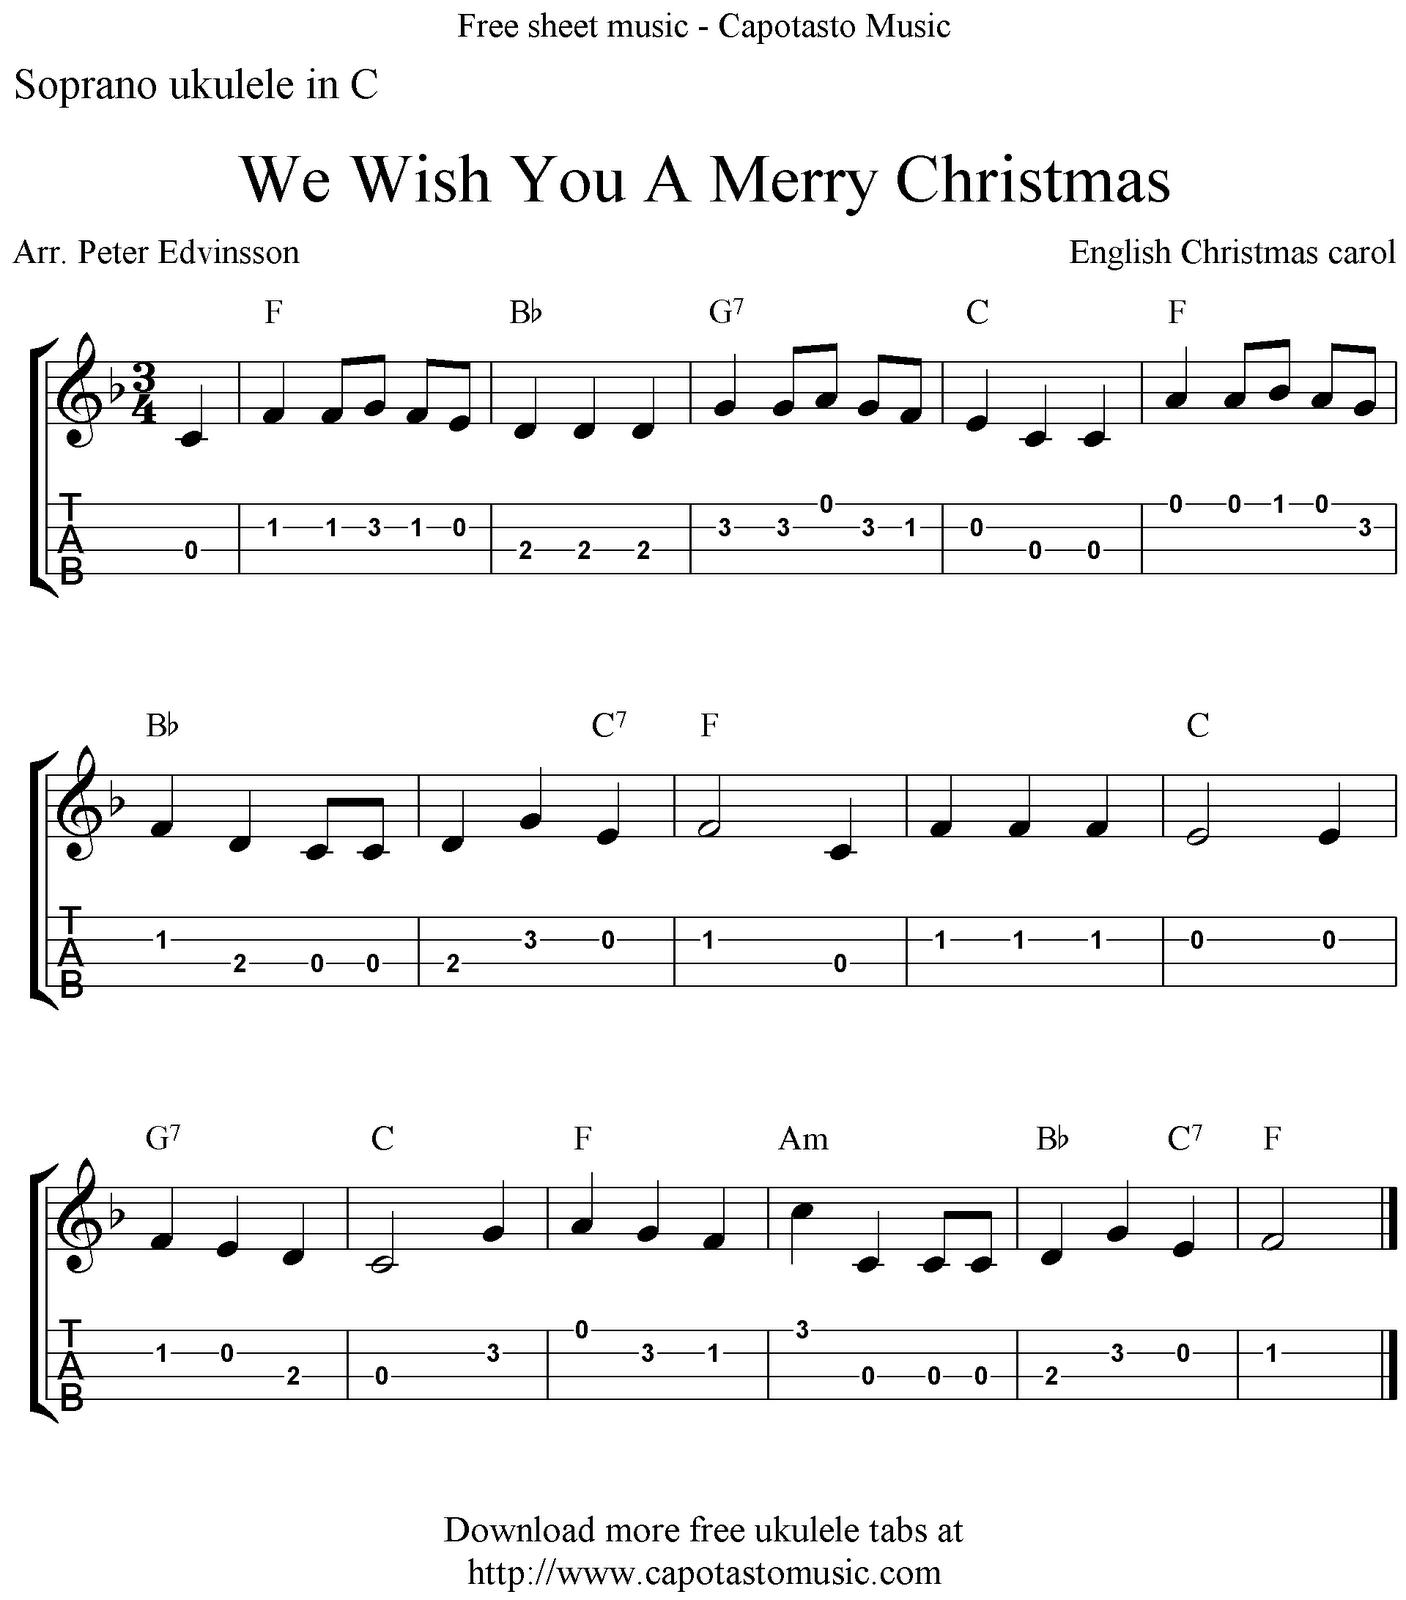 Free Sheet Music Scores We Wish You A Merry Christmas Free Christmas Ukulele Tabs Sheet Music